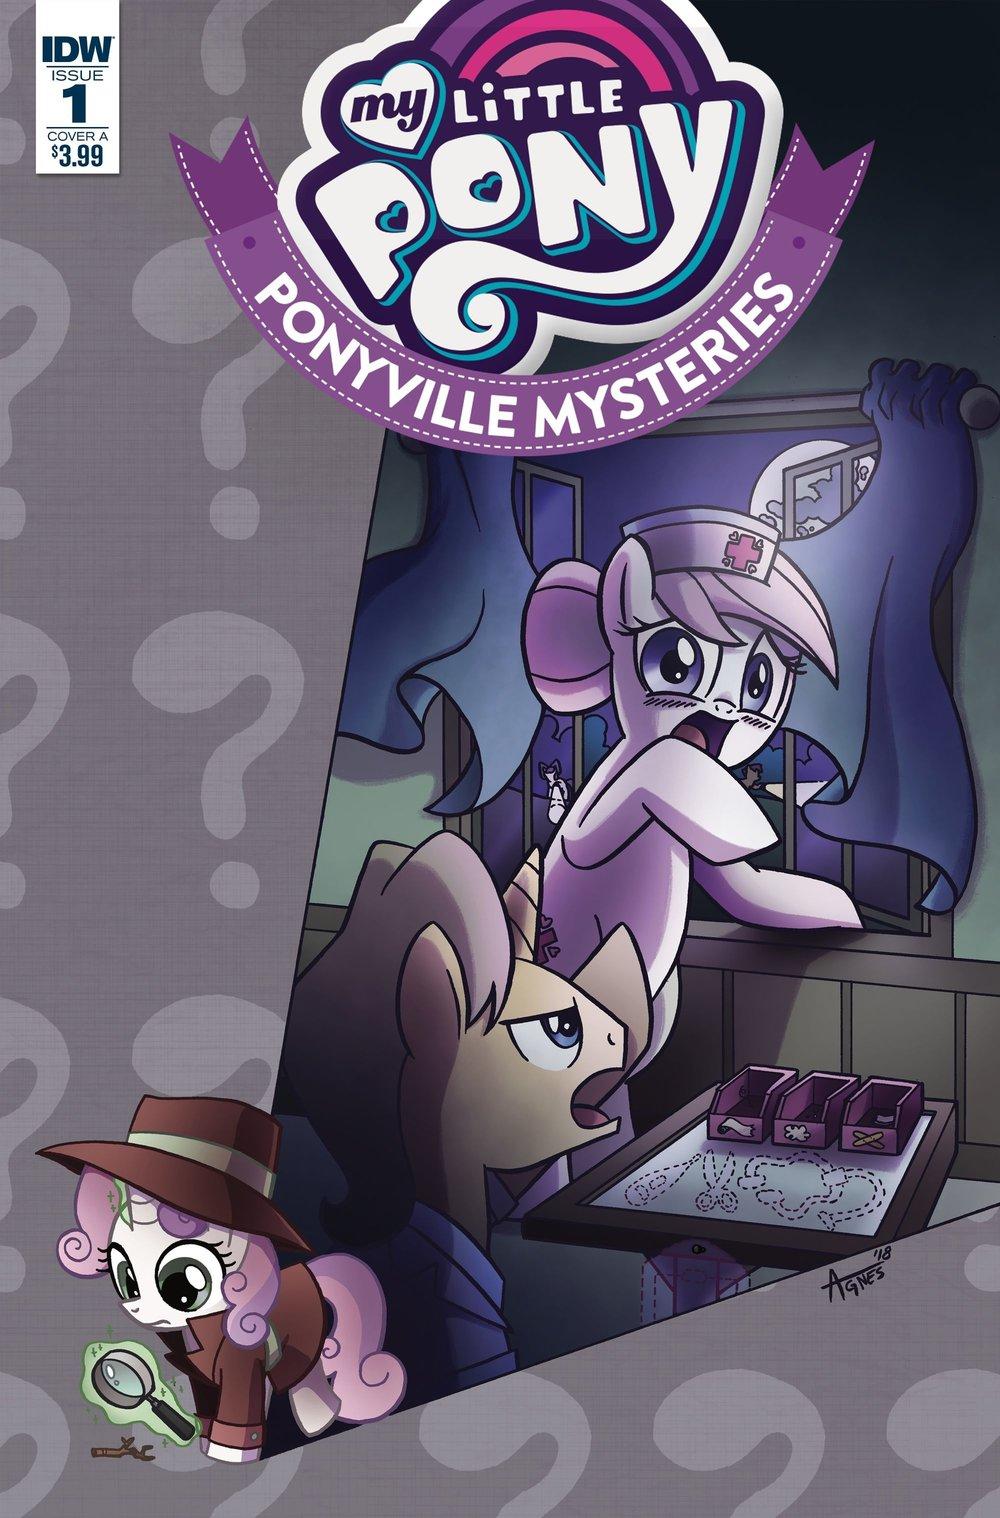 Ponyville Mysteries #1